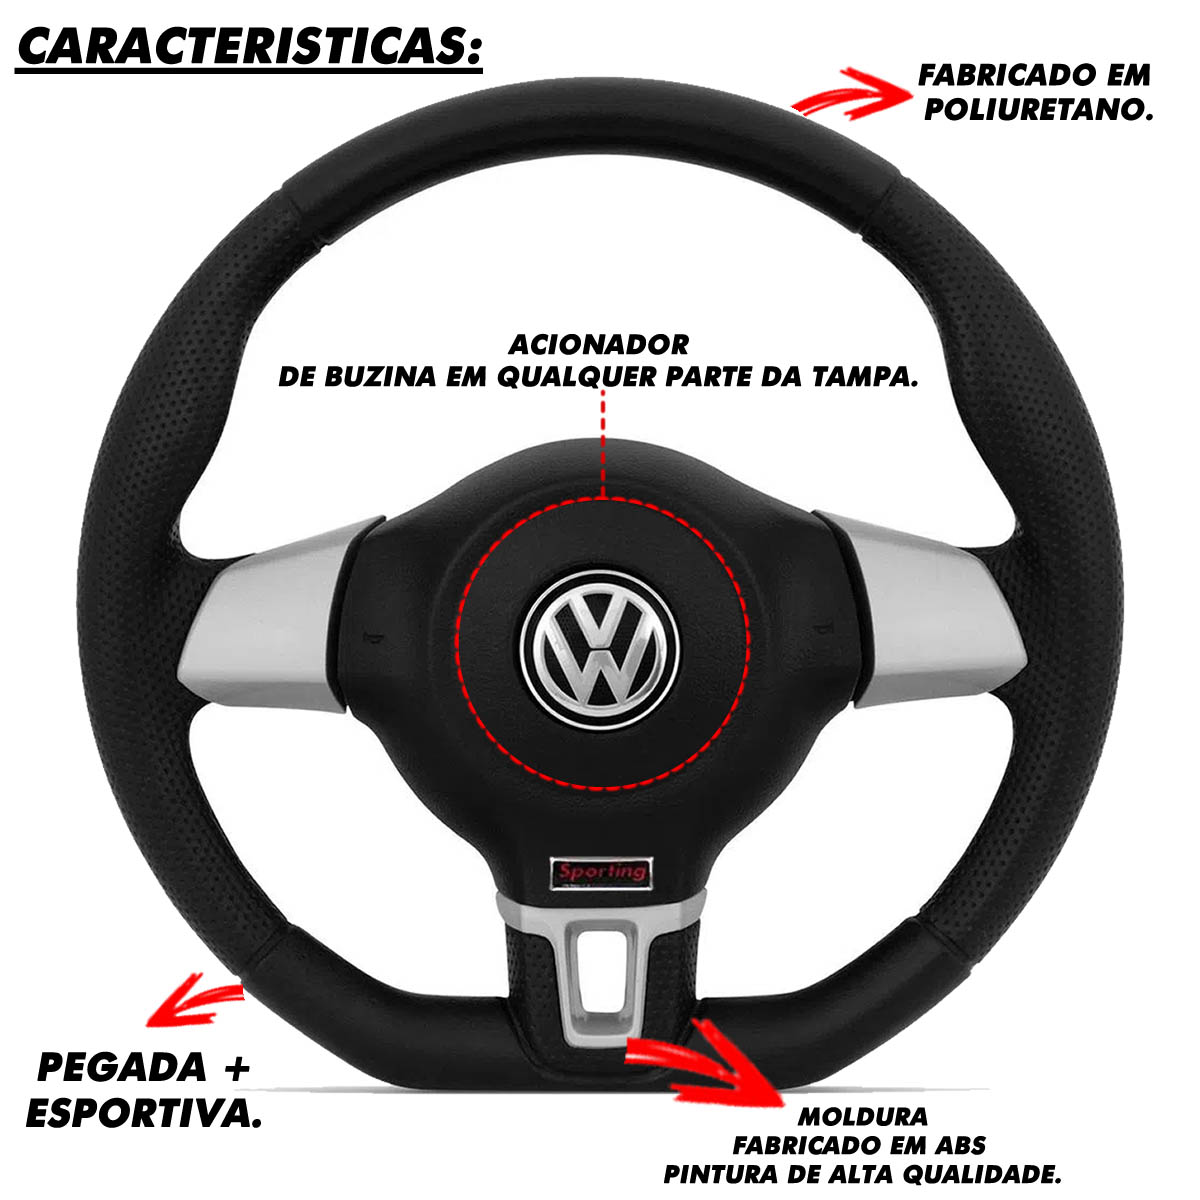 Volante Volkswagen Jetta Base Reta Esportivo Cubo Gol 1980 a 2013 Golf 1999 a 2013 Saveiro Parati 1982 a 2013 Poliparts